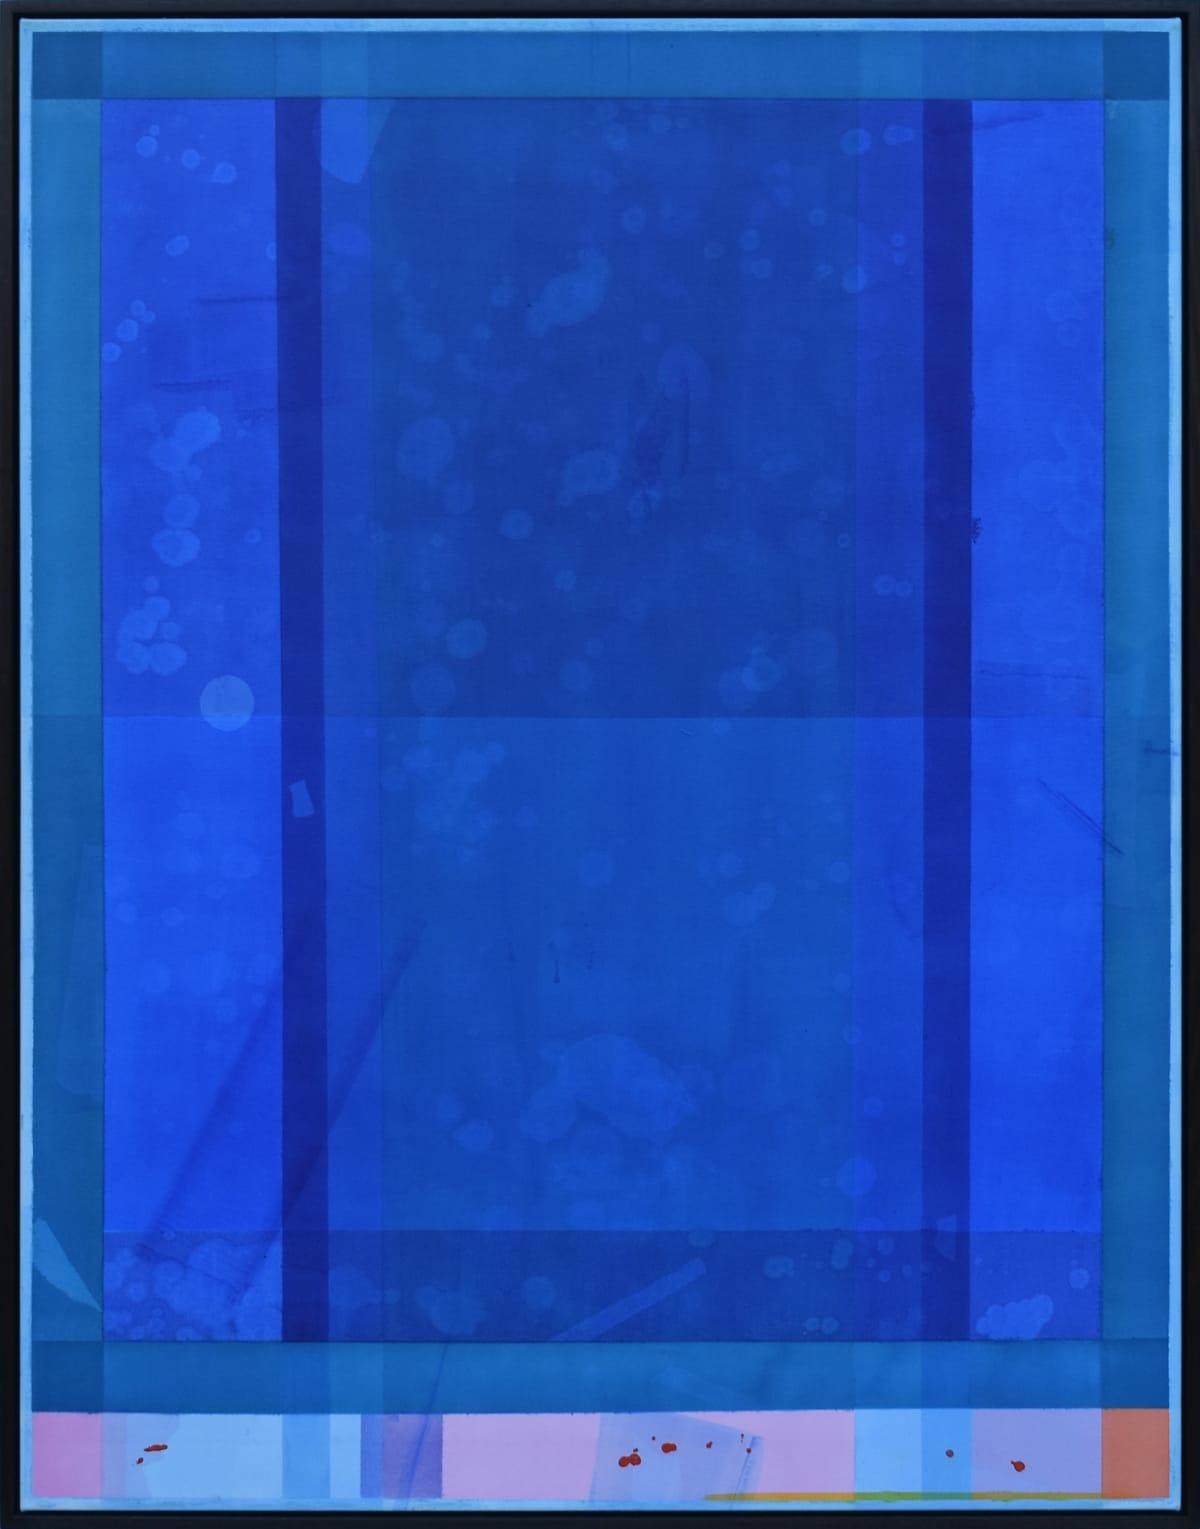 Maximilian Daniels, Clear, Blue, 2019